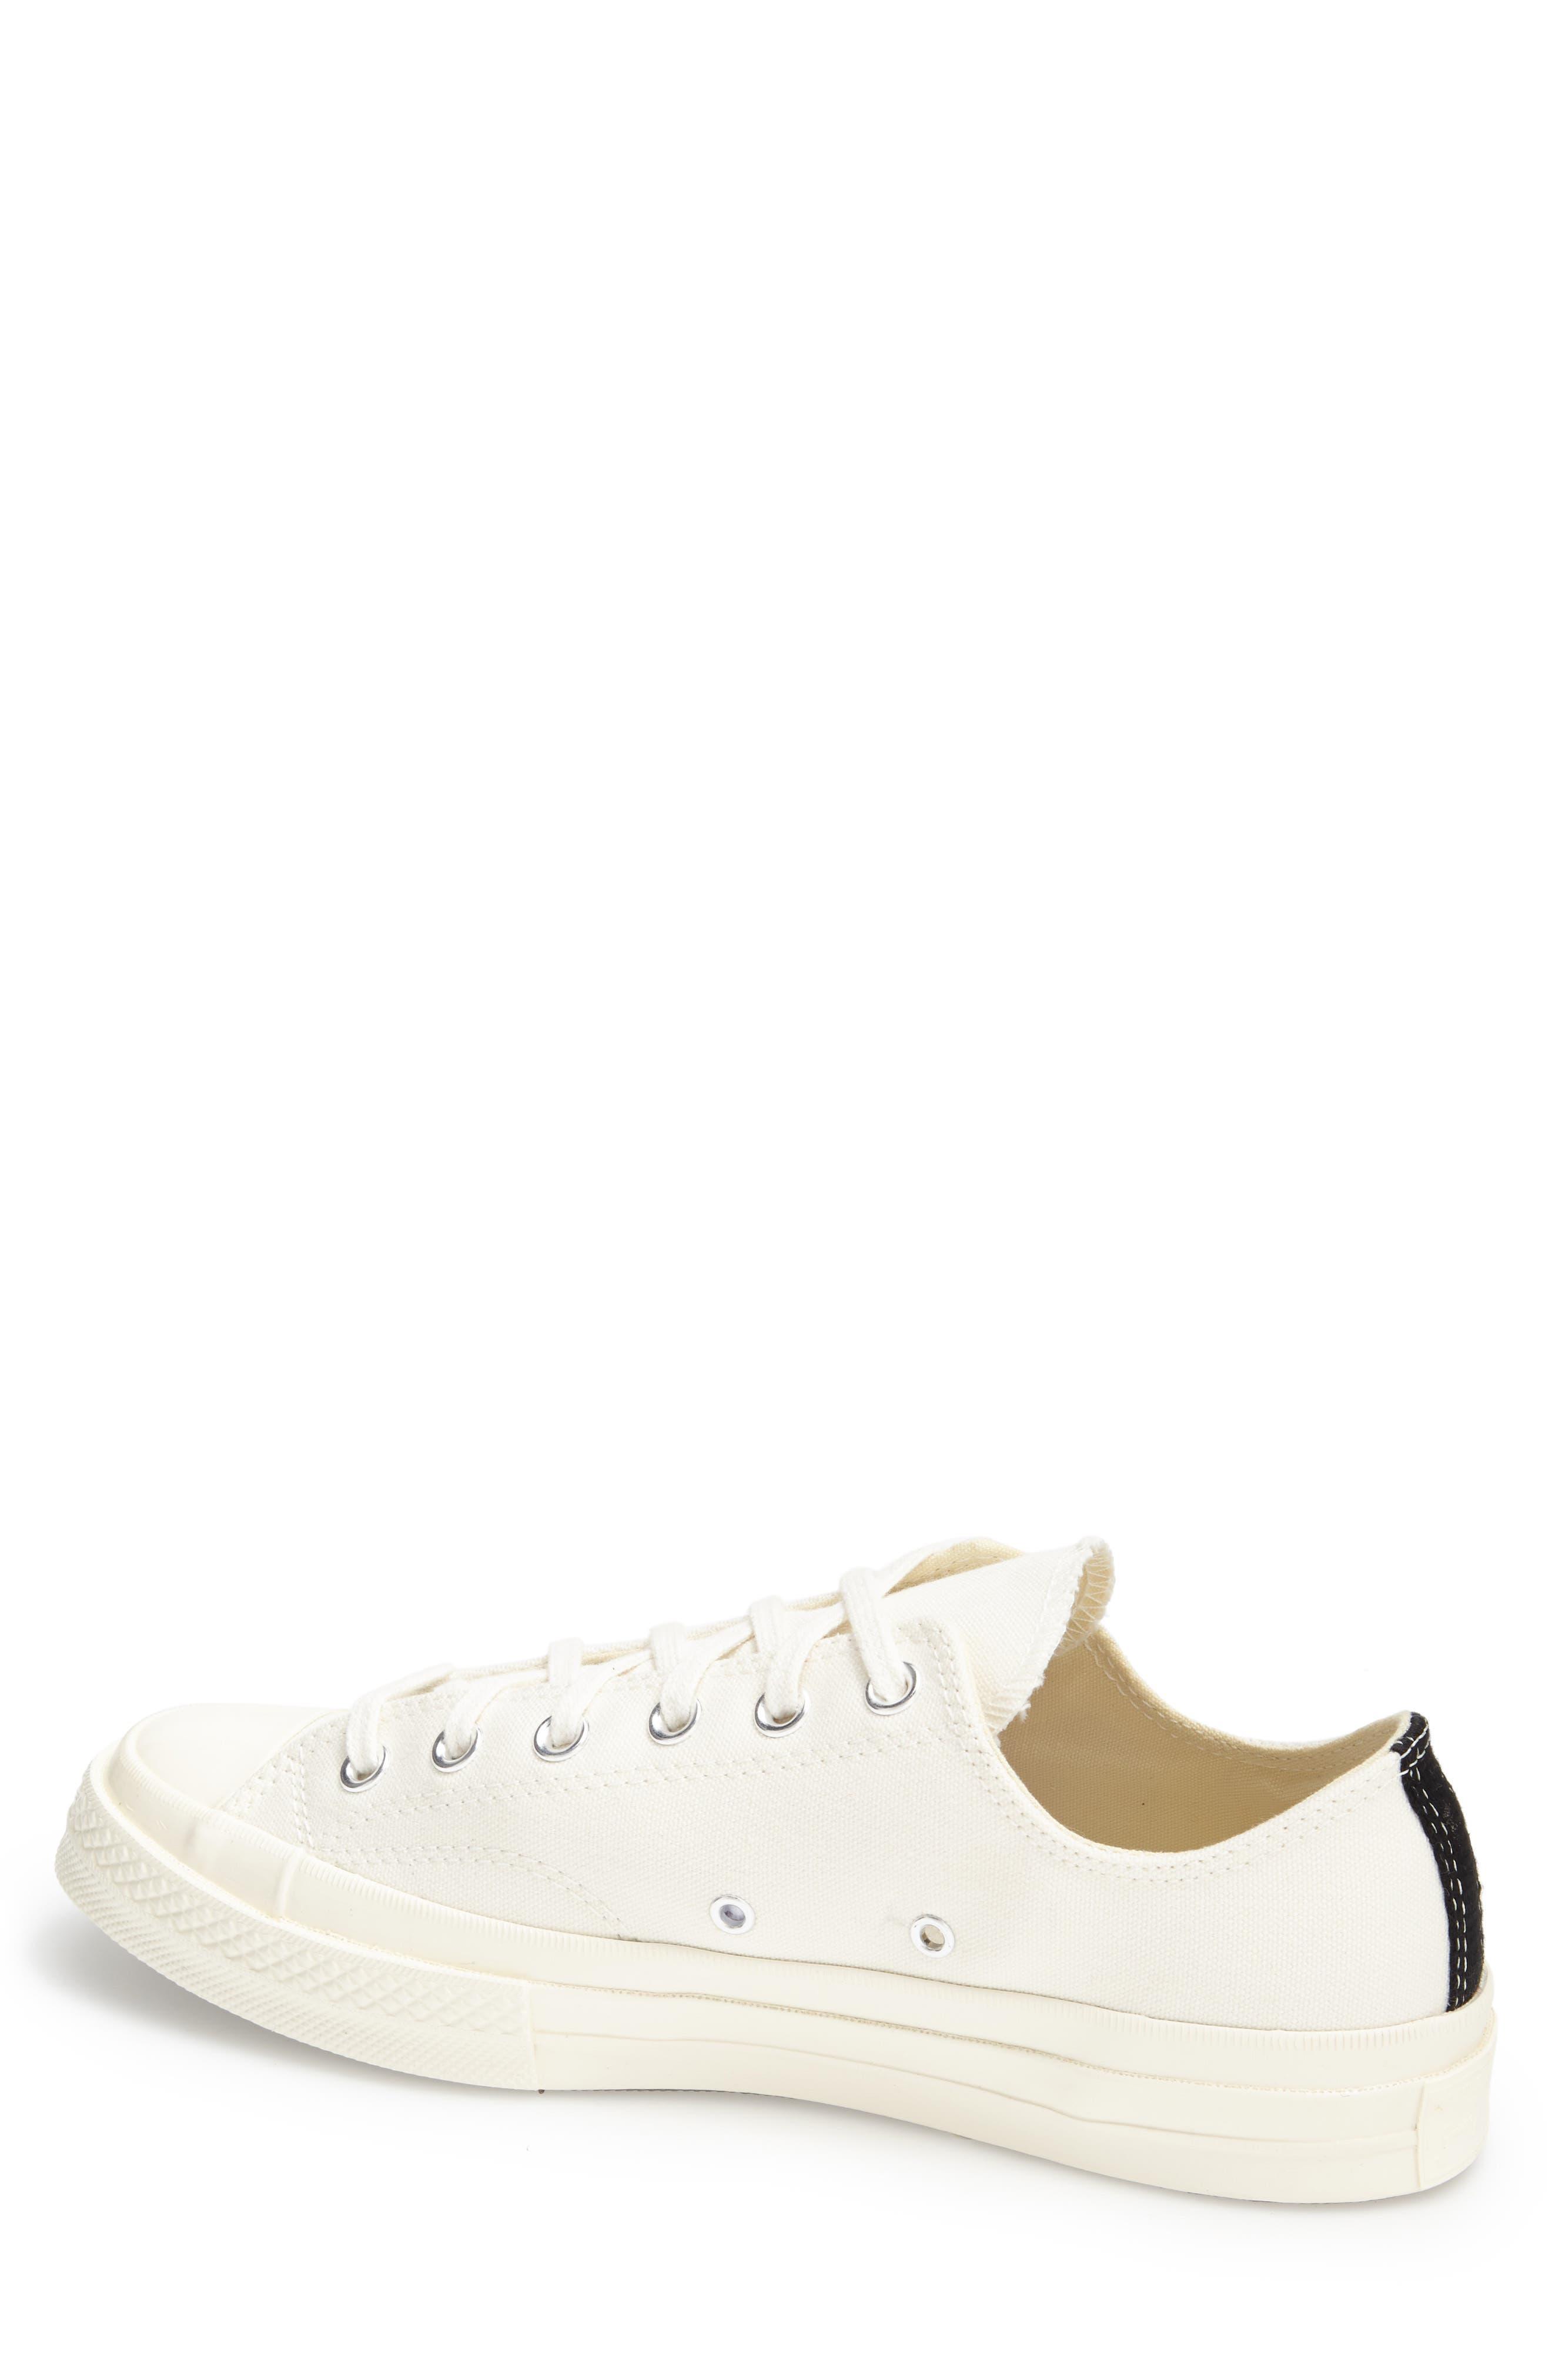 x Converse Chuck Taylor<sup>®</sup> Hidden Heart Low Top Sneaker, Main, color, BEIGE